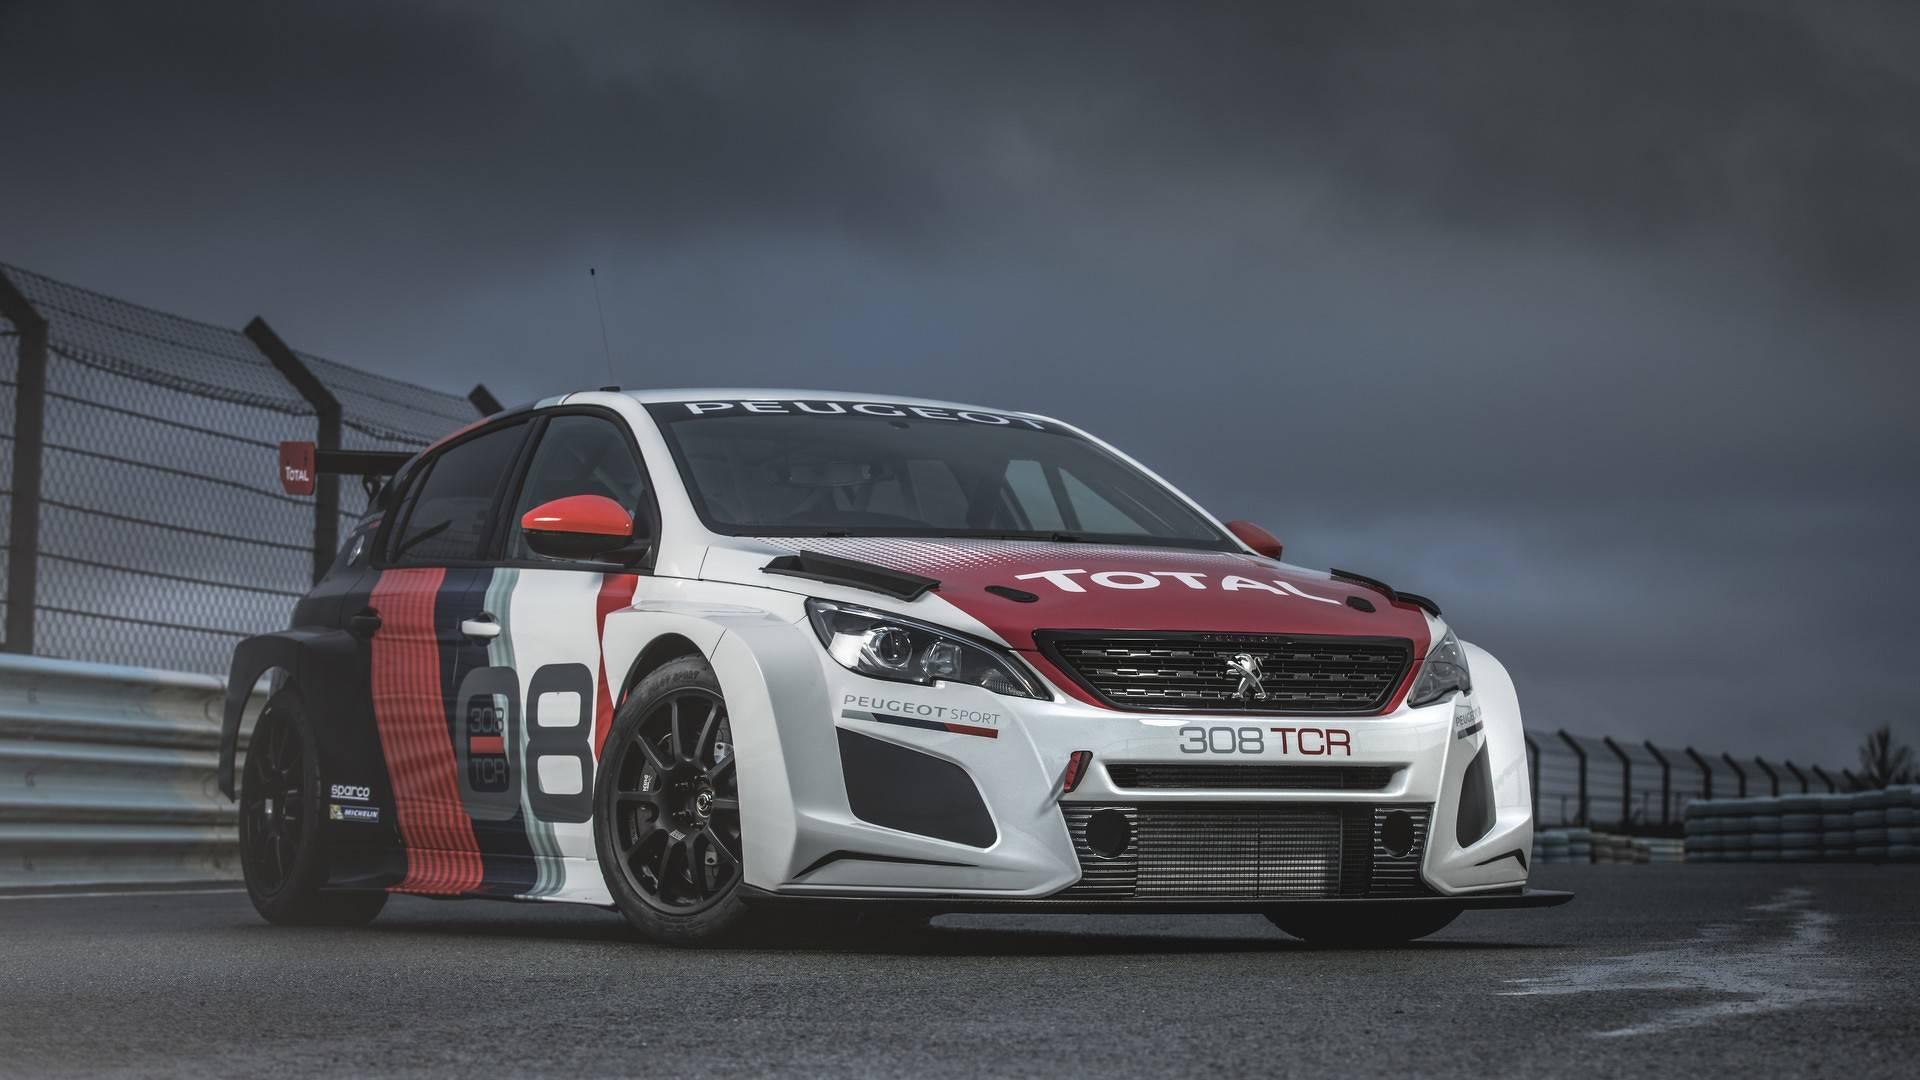 Peugeot 308 TCR 2018 (9)